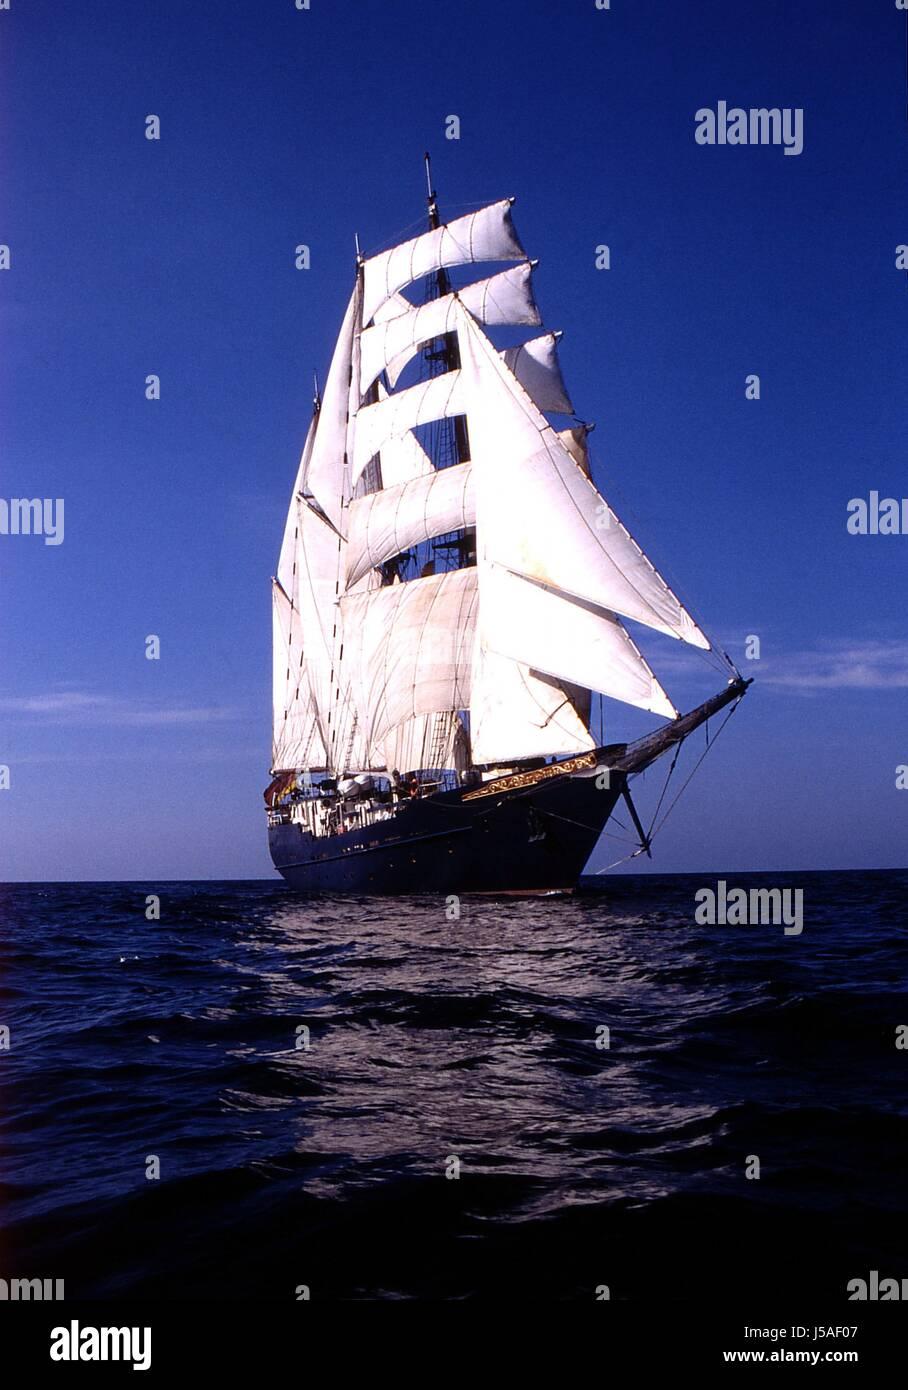 Fernweh Romantik Natur Windjammer Grosegler Unter Vollen segeln Stockbild